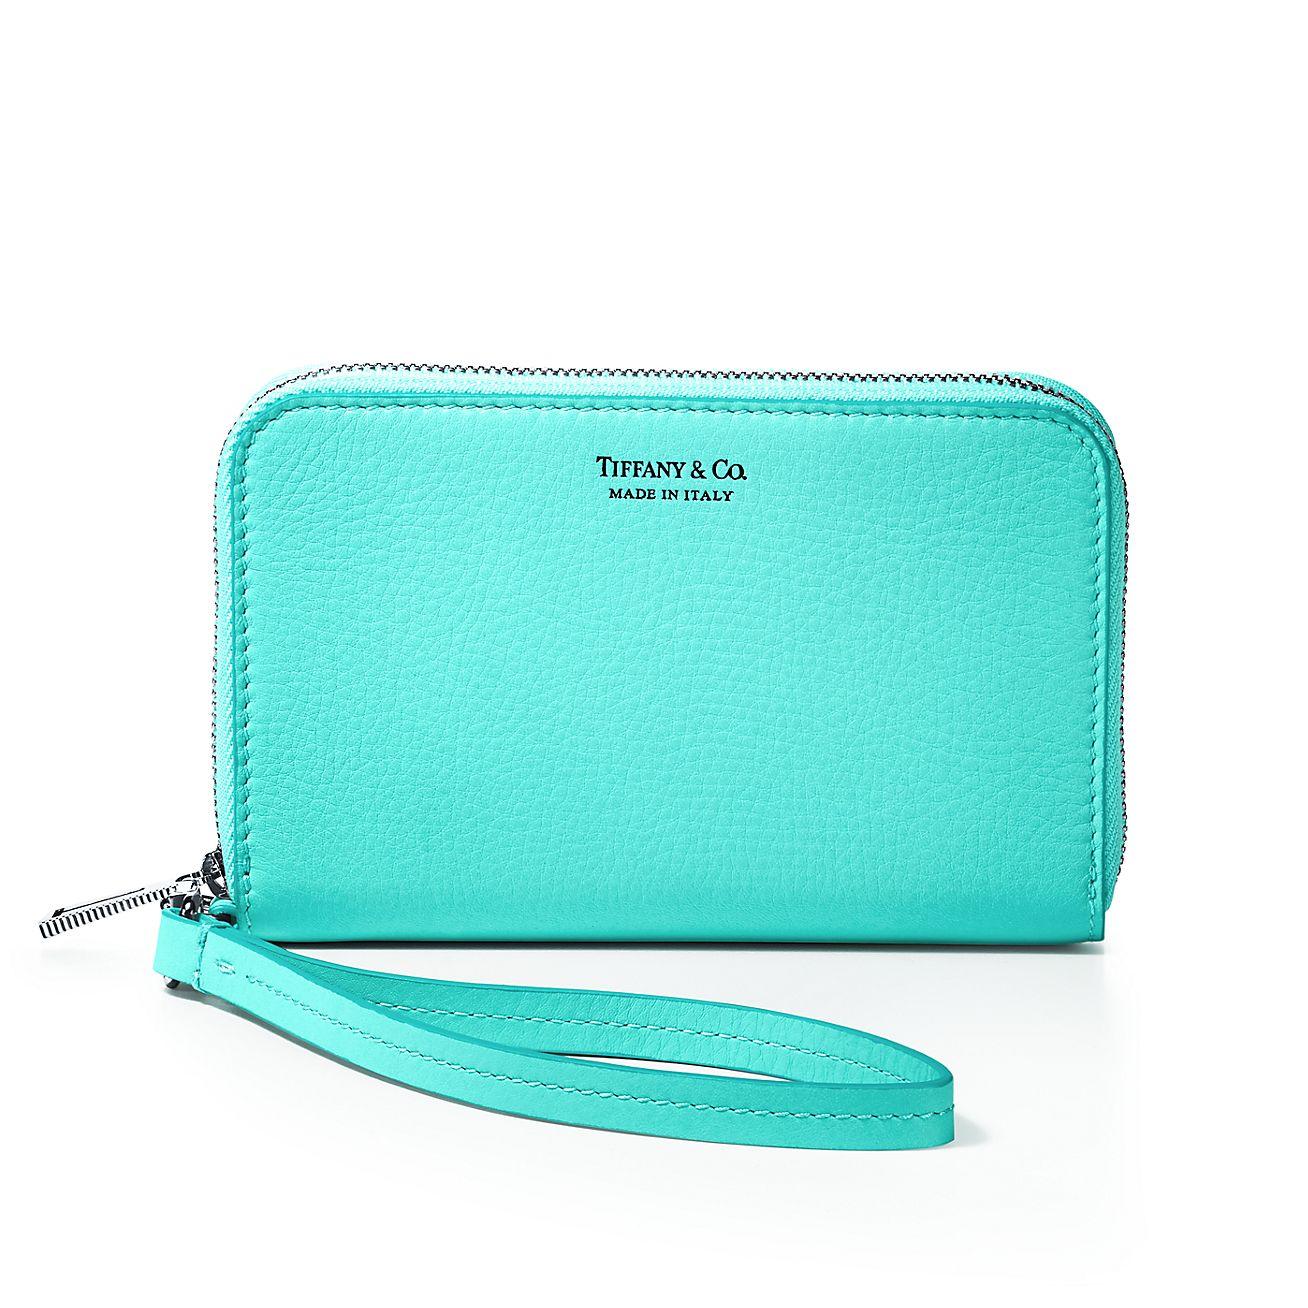 Zip wallet in Tiffany Blue grain calfskin leather Tiffany & Co. CxFWox173E